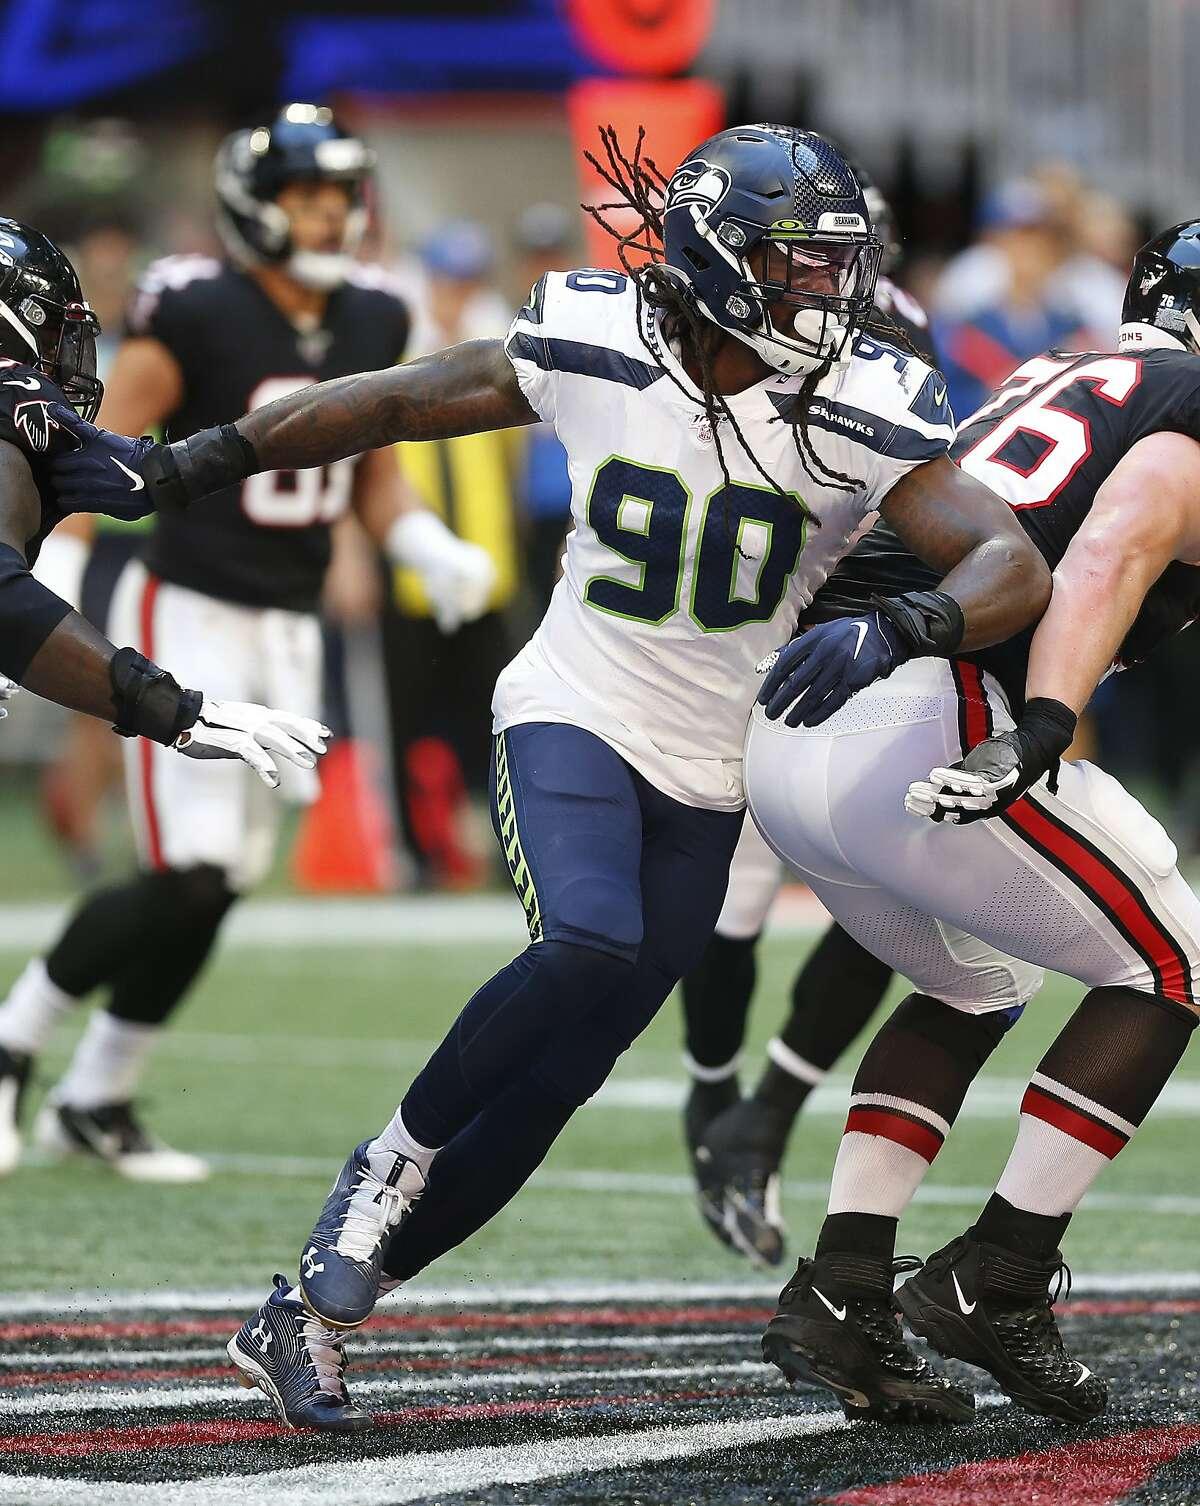 Seattle Seahawks defensive end Jadeveon Clowney (90) runs in the backfield in a week 7 NFL football game against the Atlanta Falcons, Sunday, Sep. 27, 2019 in Atlanta. (Michael Zarrilli/AP Images for Panini, via AP)